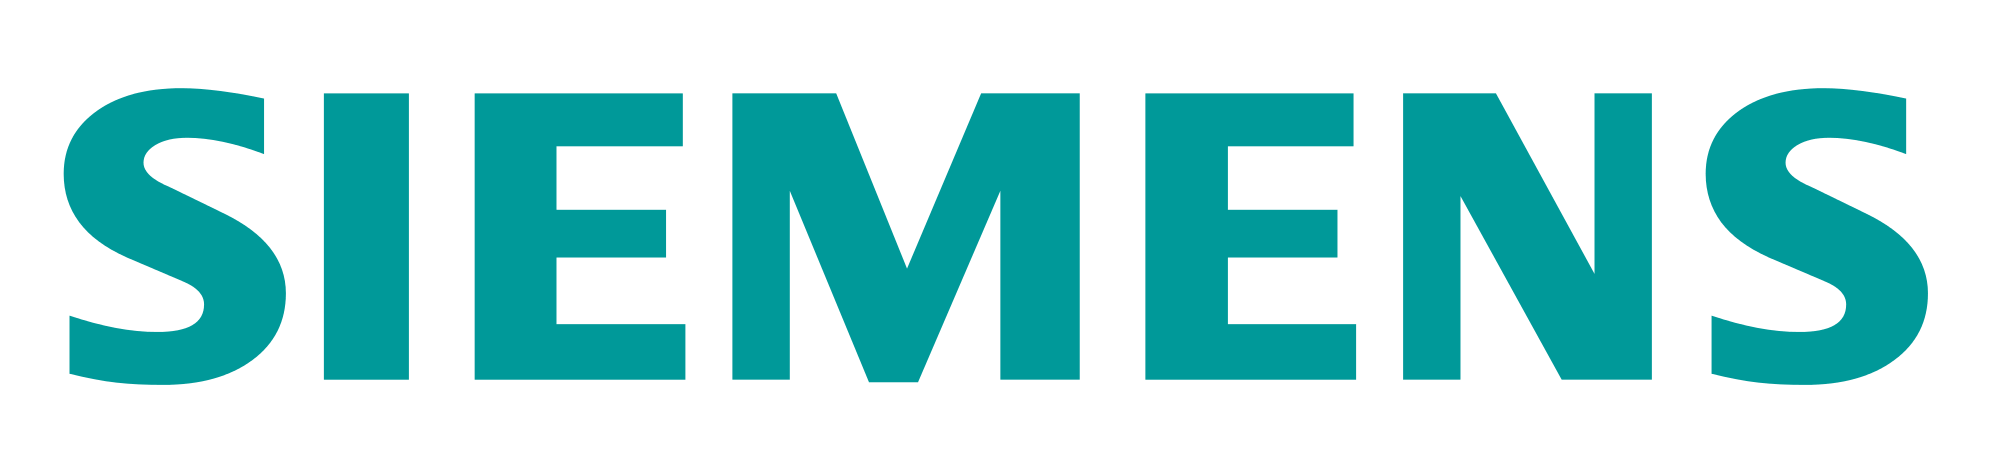 Siemens, logo